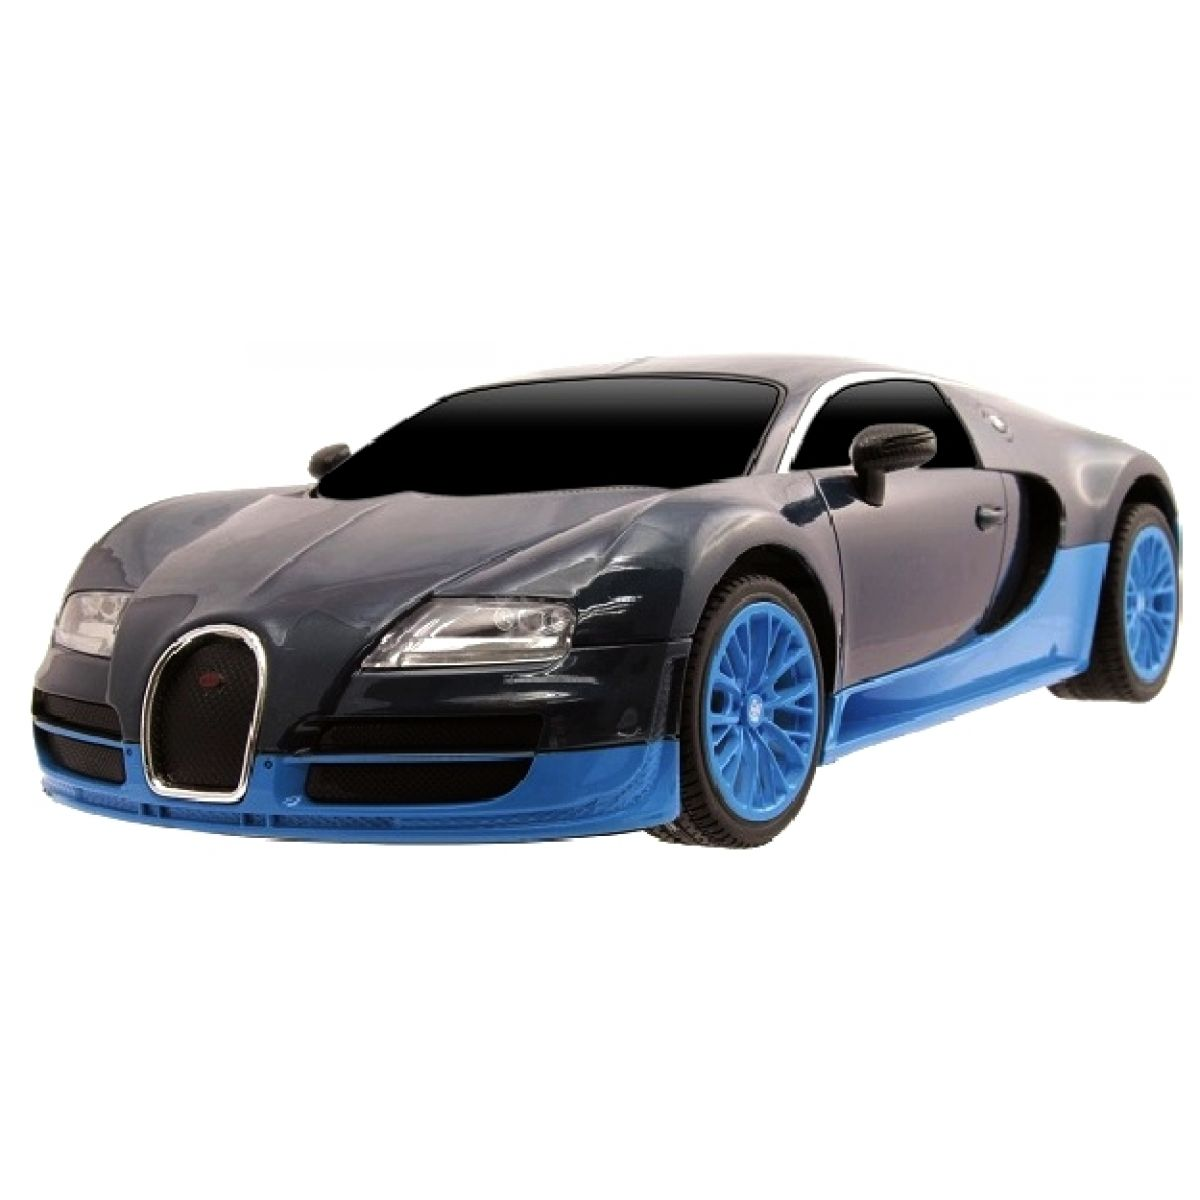 RC Auto Bugatti 16.4 Super Sport 1:26 - Modrá